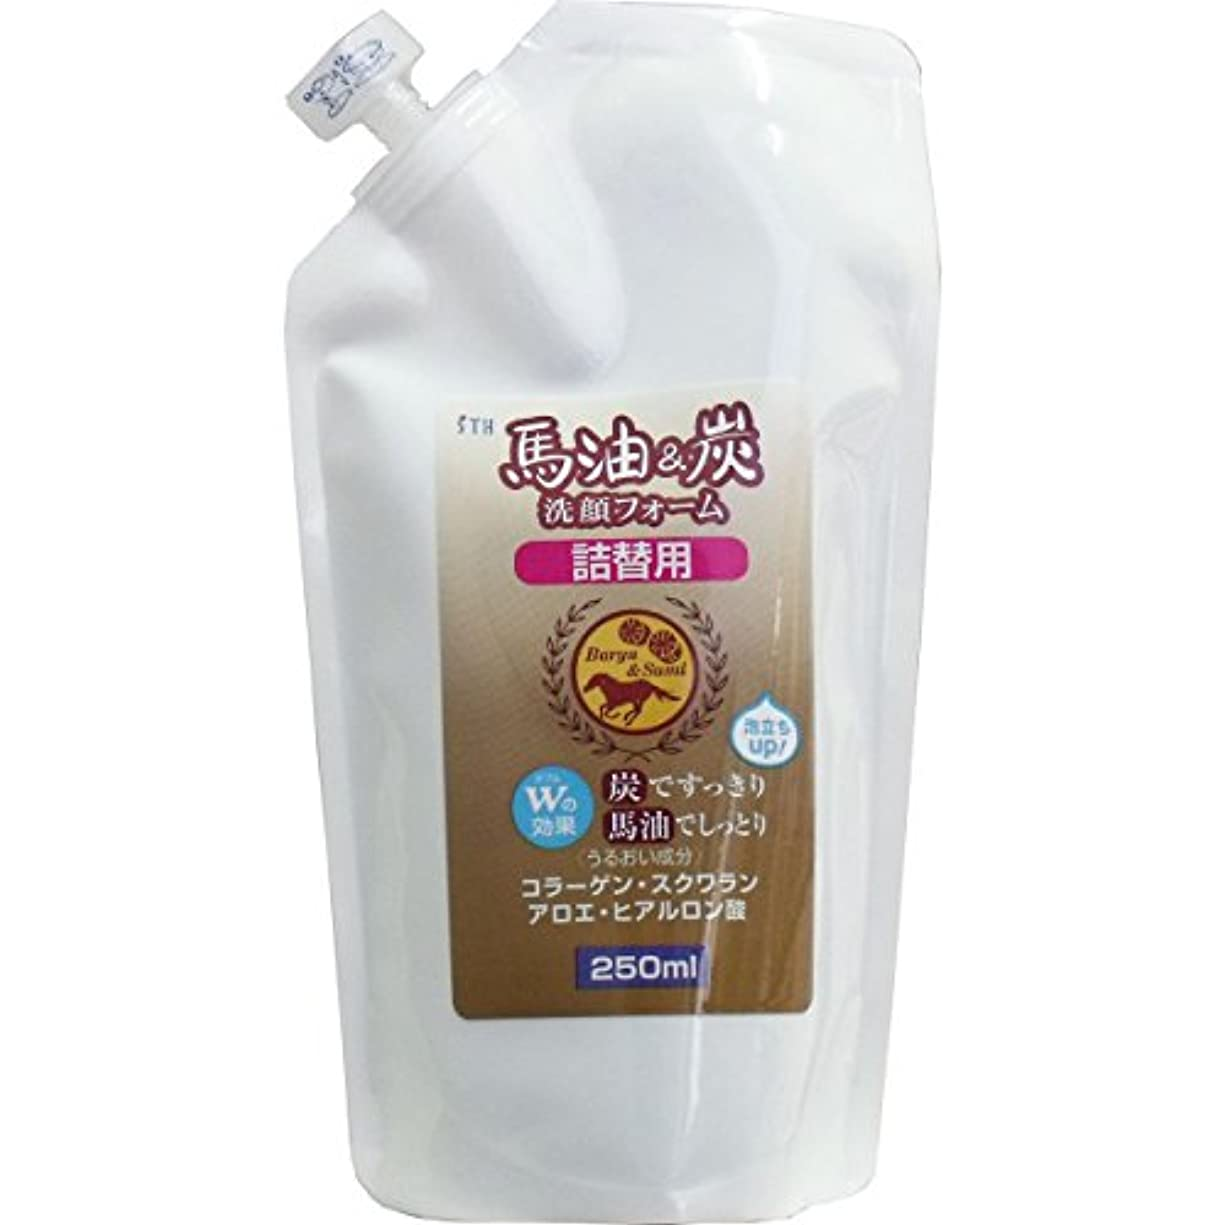 反対賛美歌中古馬油&炭洗顔フォーム【詰替用250ml】×2袋